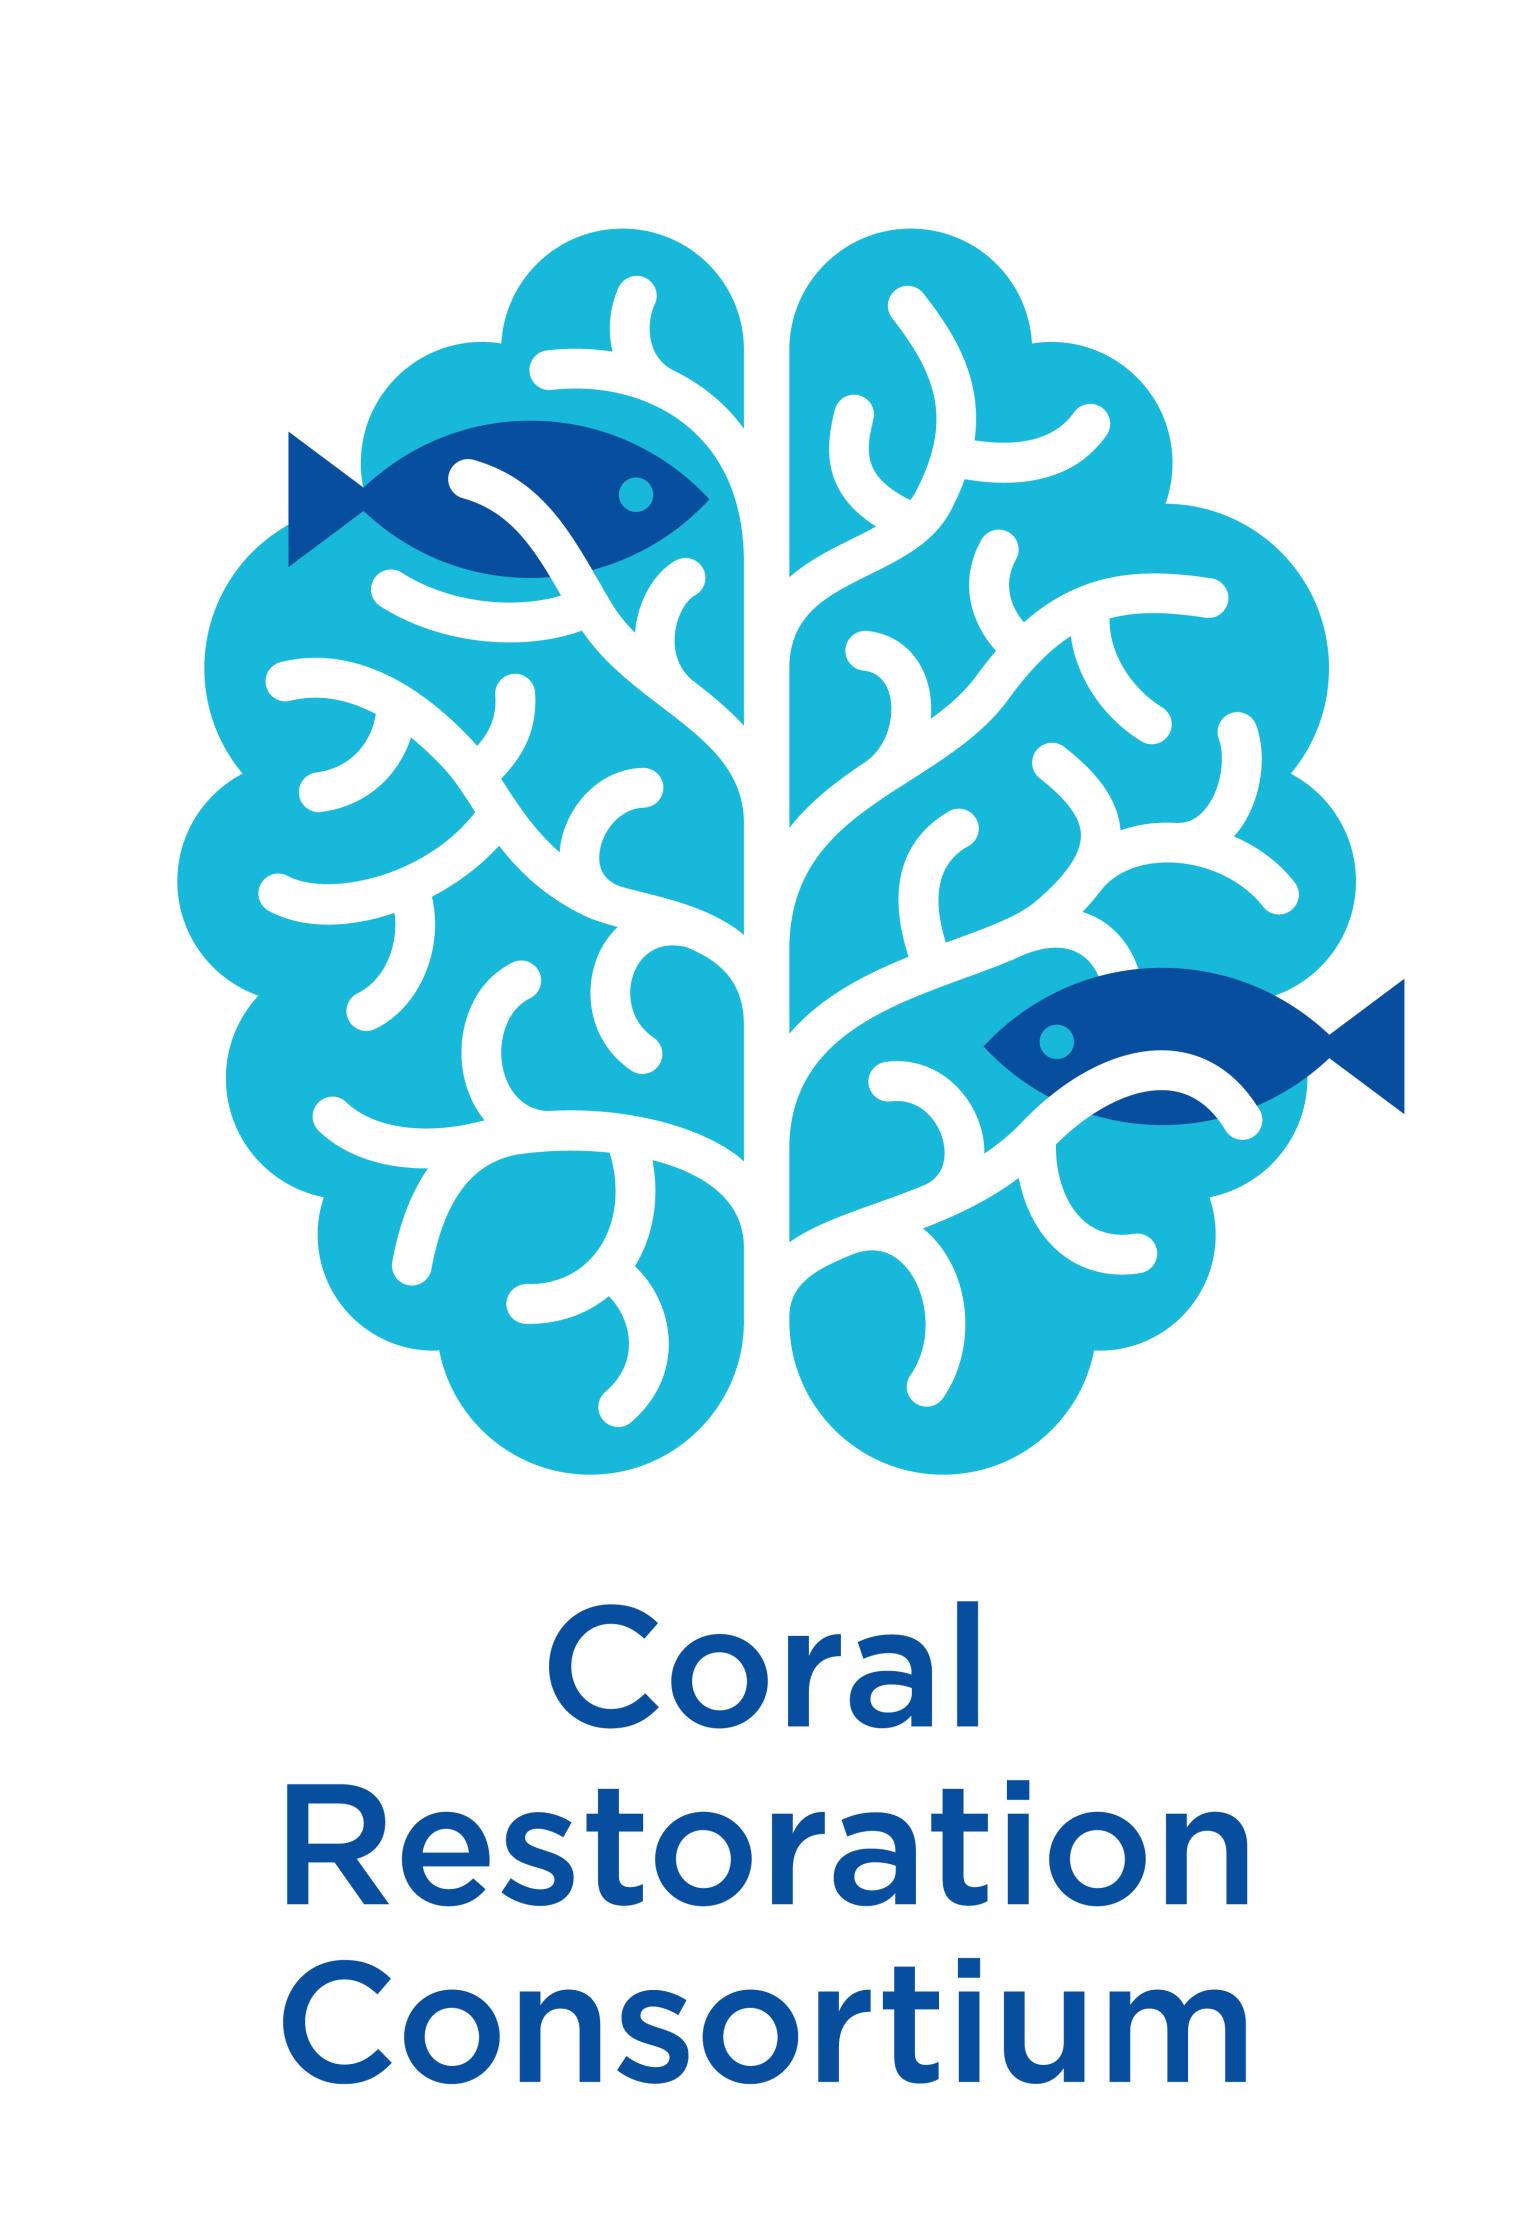 Coral-Restoration-Consortium-logo.jpg